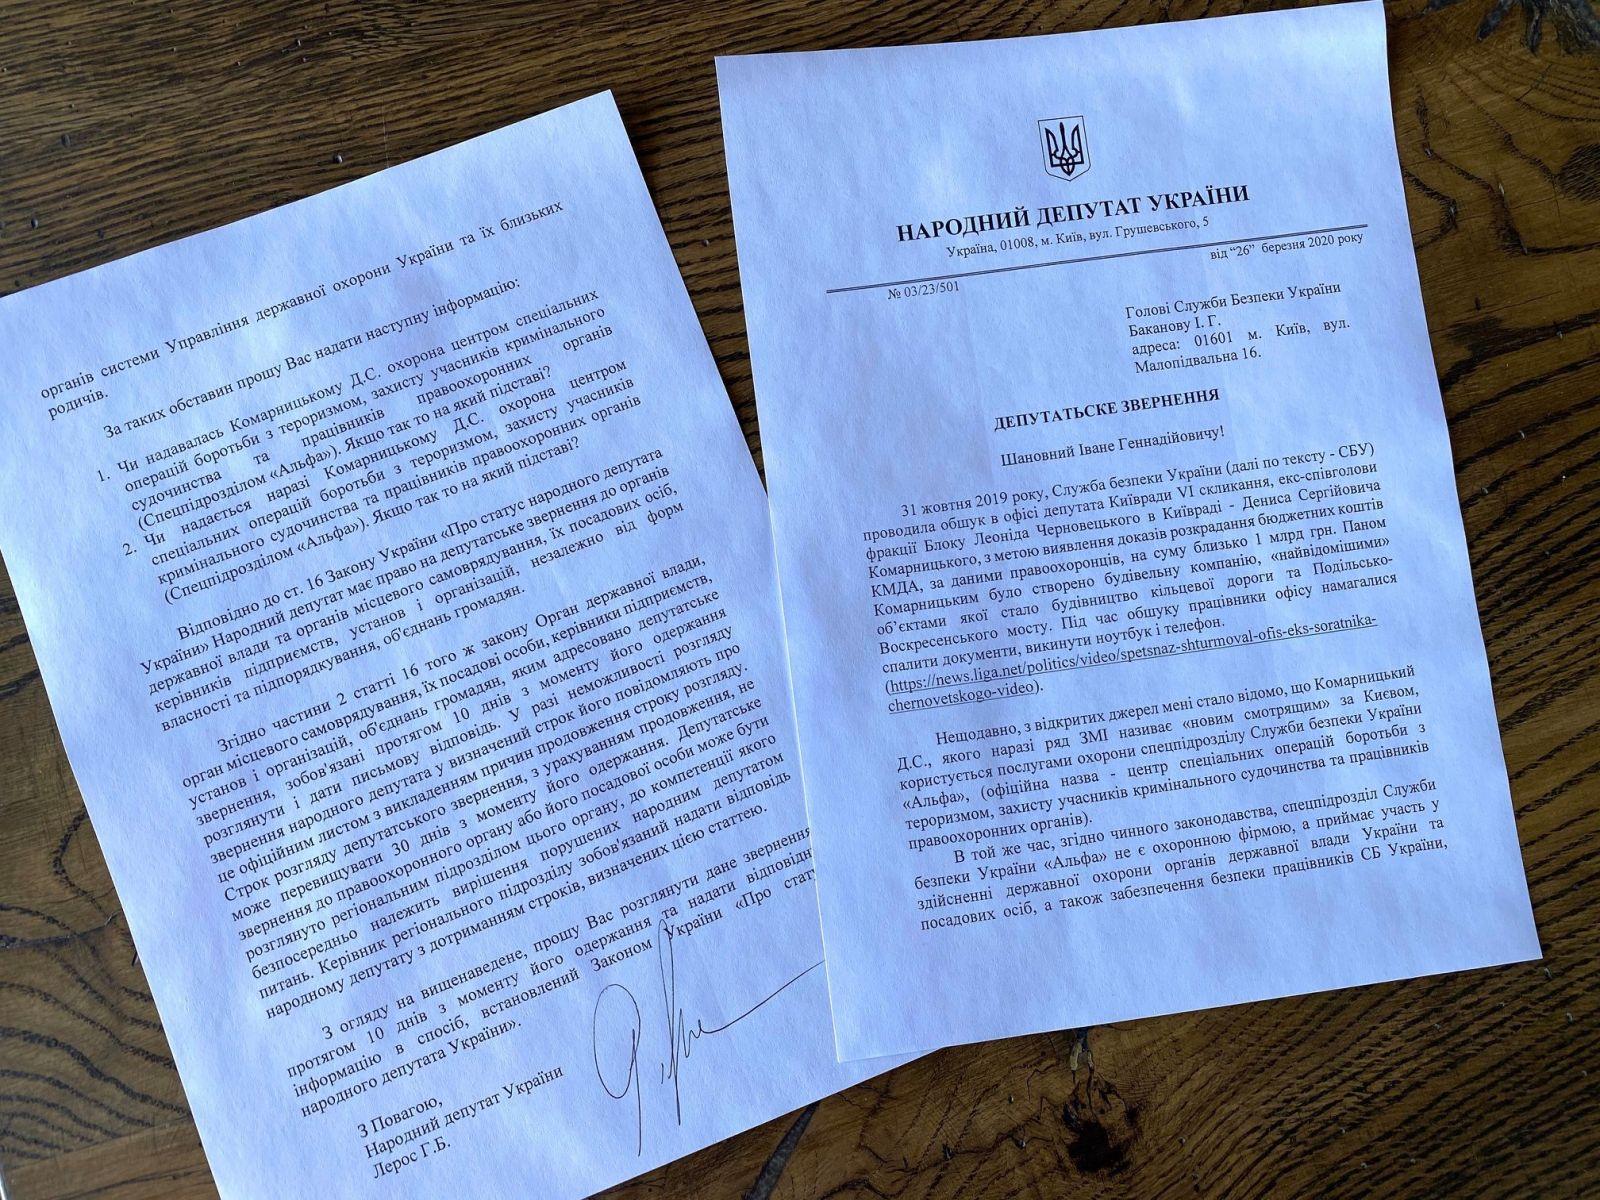 Звернення Лероса до СБУ з приводу охорони Комарницького, фото — Фейсбук Гео Лероса